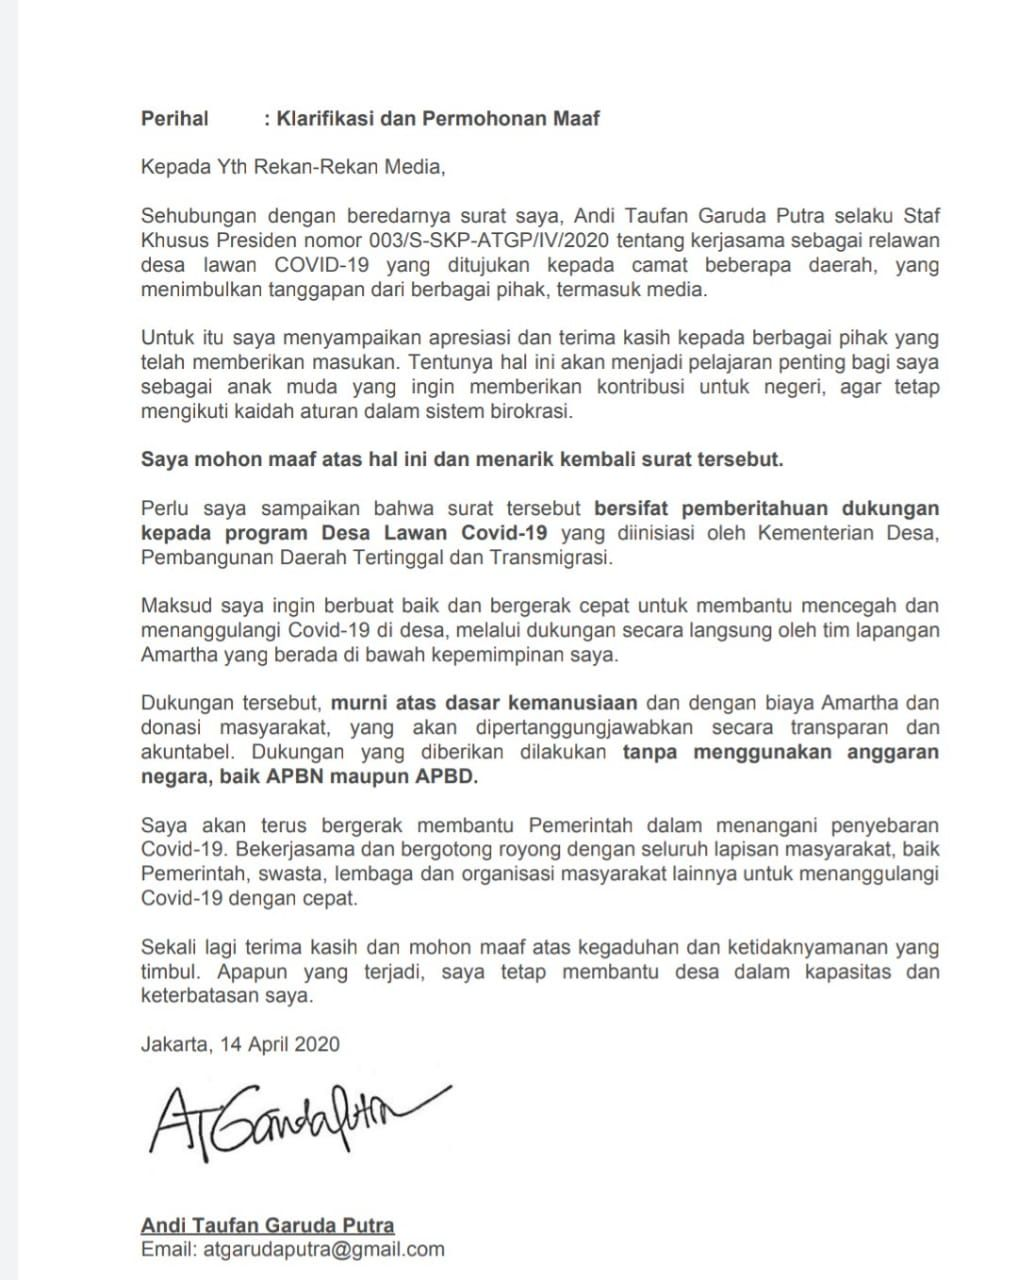 Surat Staf khusus Presiden Joko Widodo (Jokowi), Andi Taufan Garuda Putra